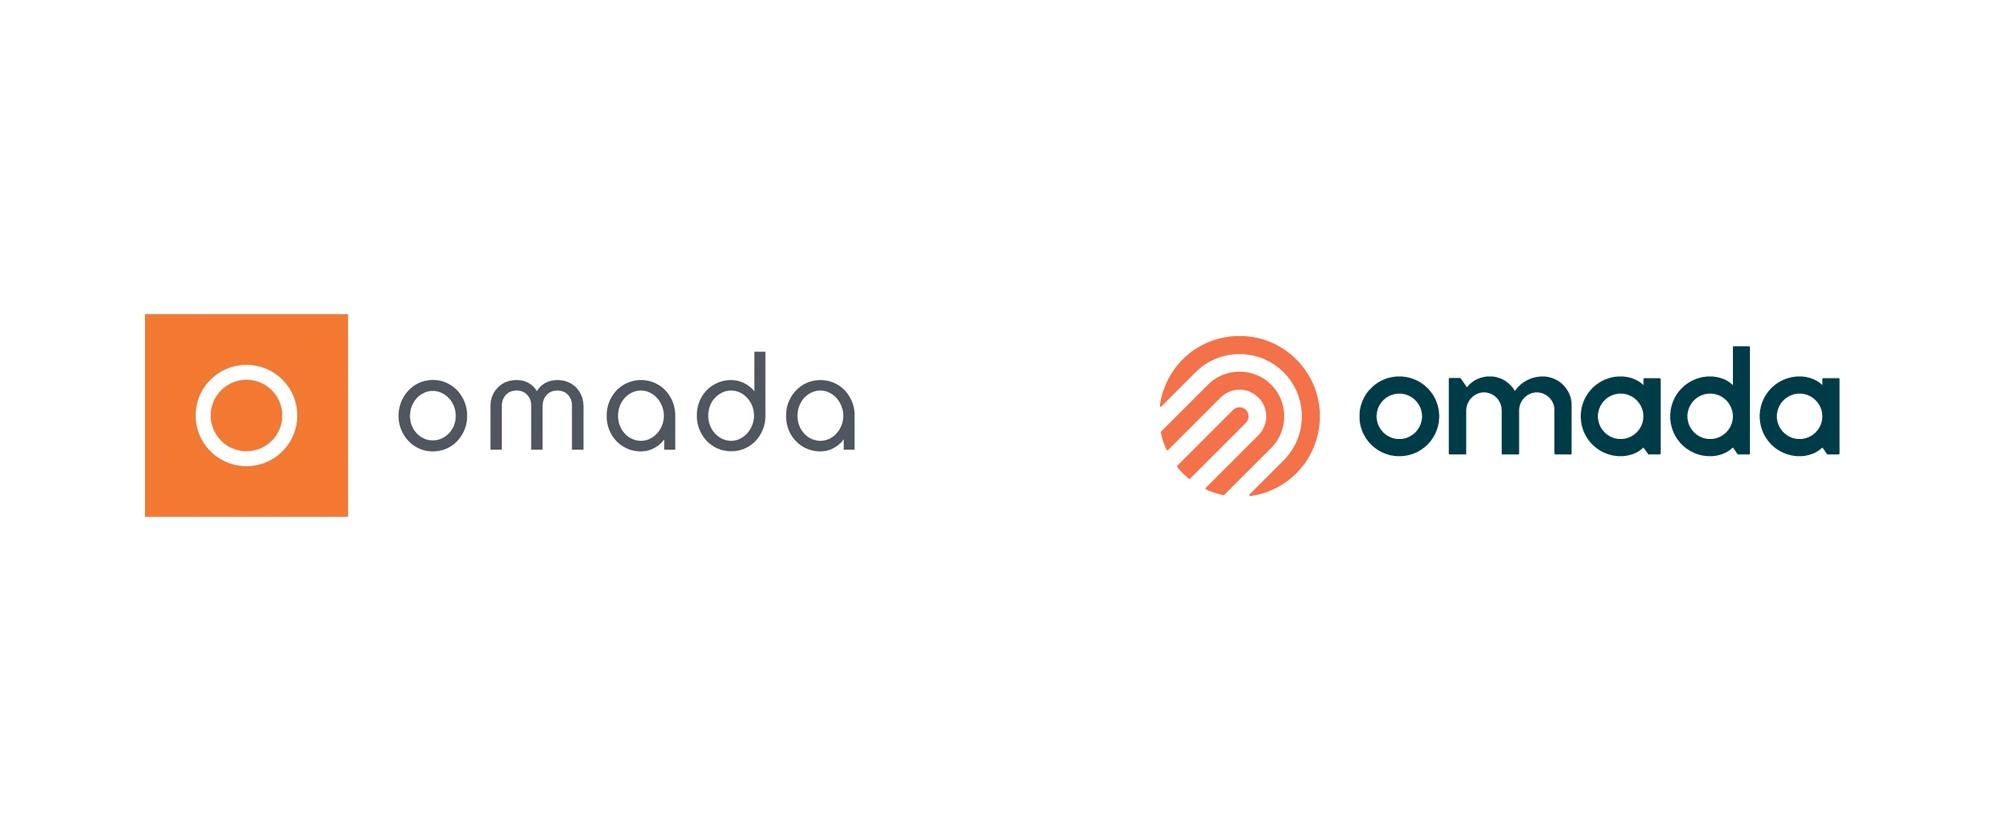 New Logo and Identity for Omada